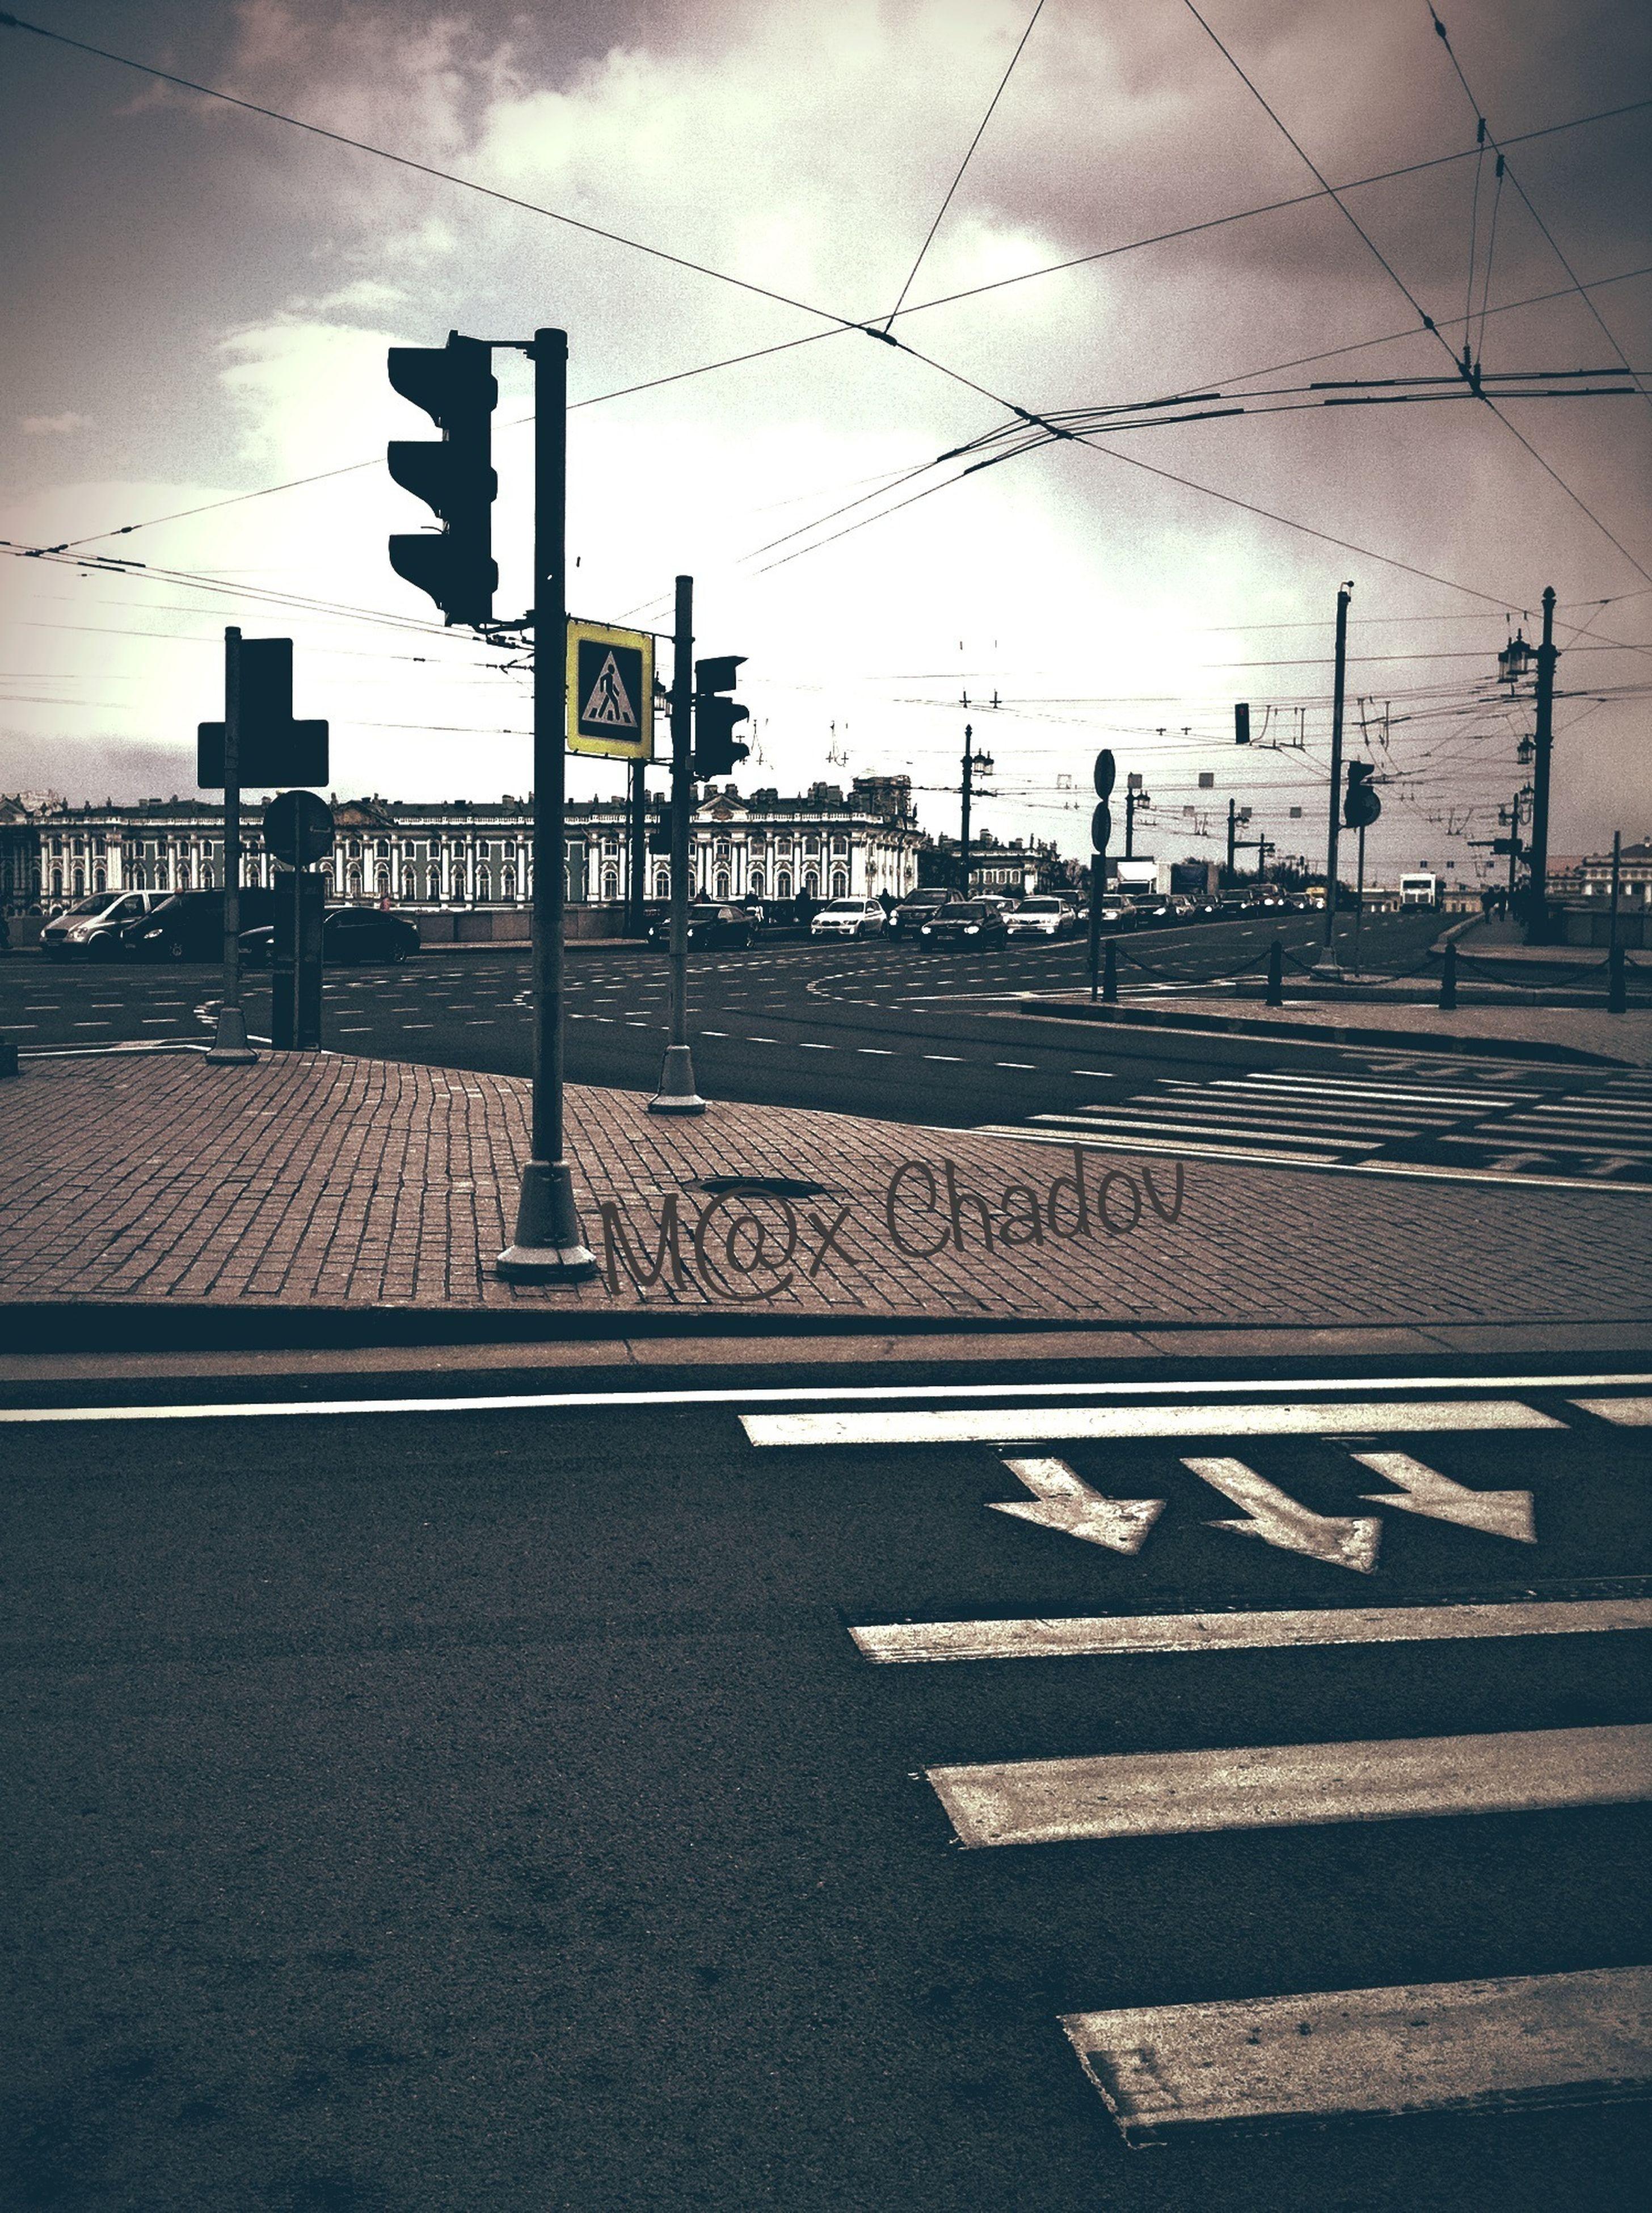 road marking, sky, street, built structure, architecture, building exterior, road, city, transportation, communication, cloud - sky, sunset, street light, sunlight, text, outdoors, city life, guidance, arrow symbol, shadow